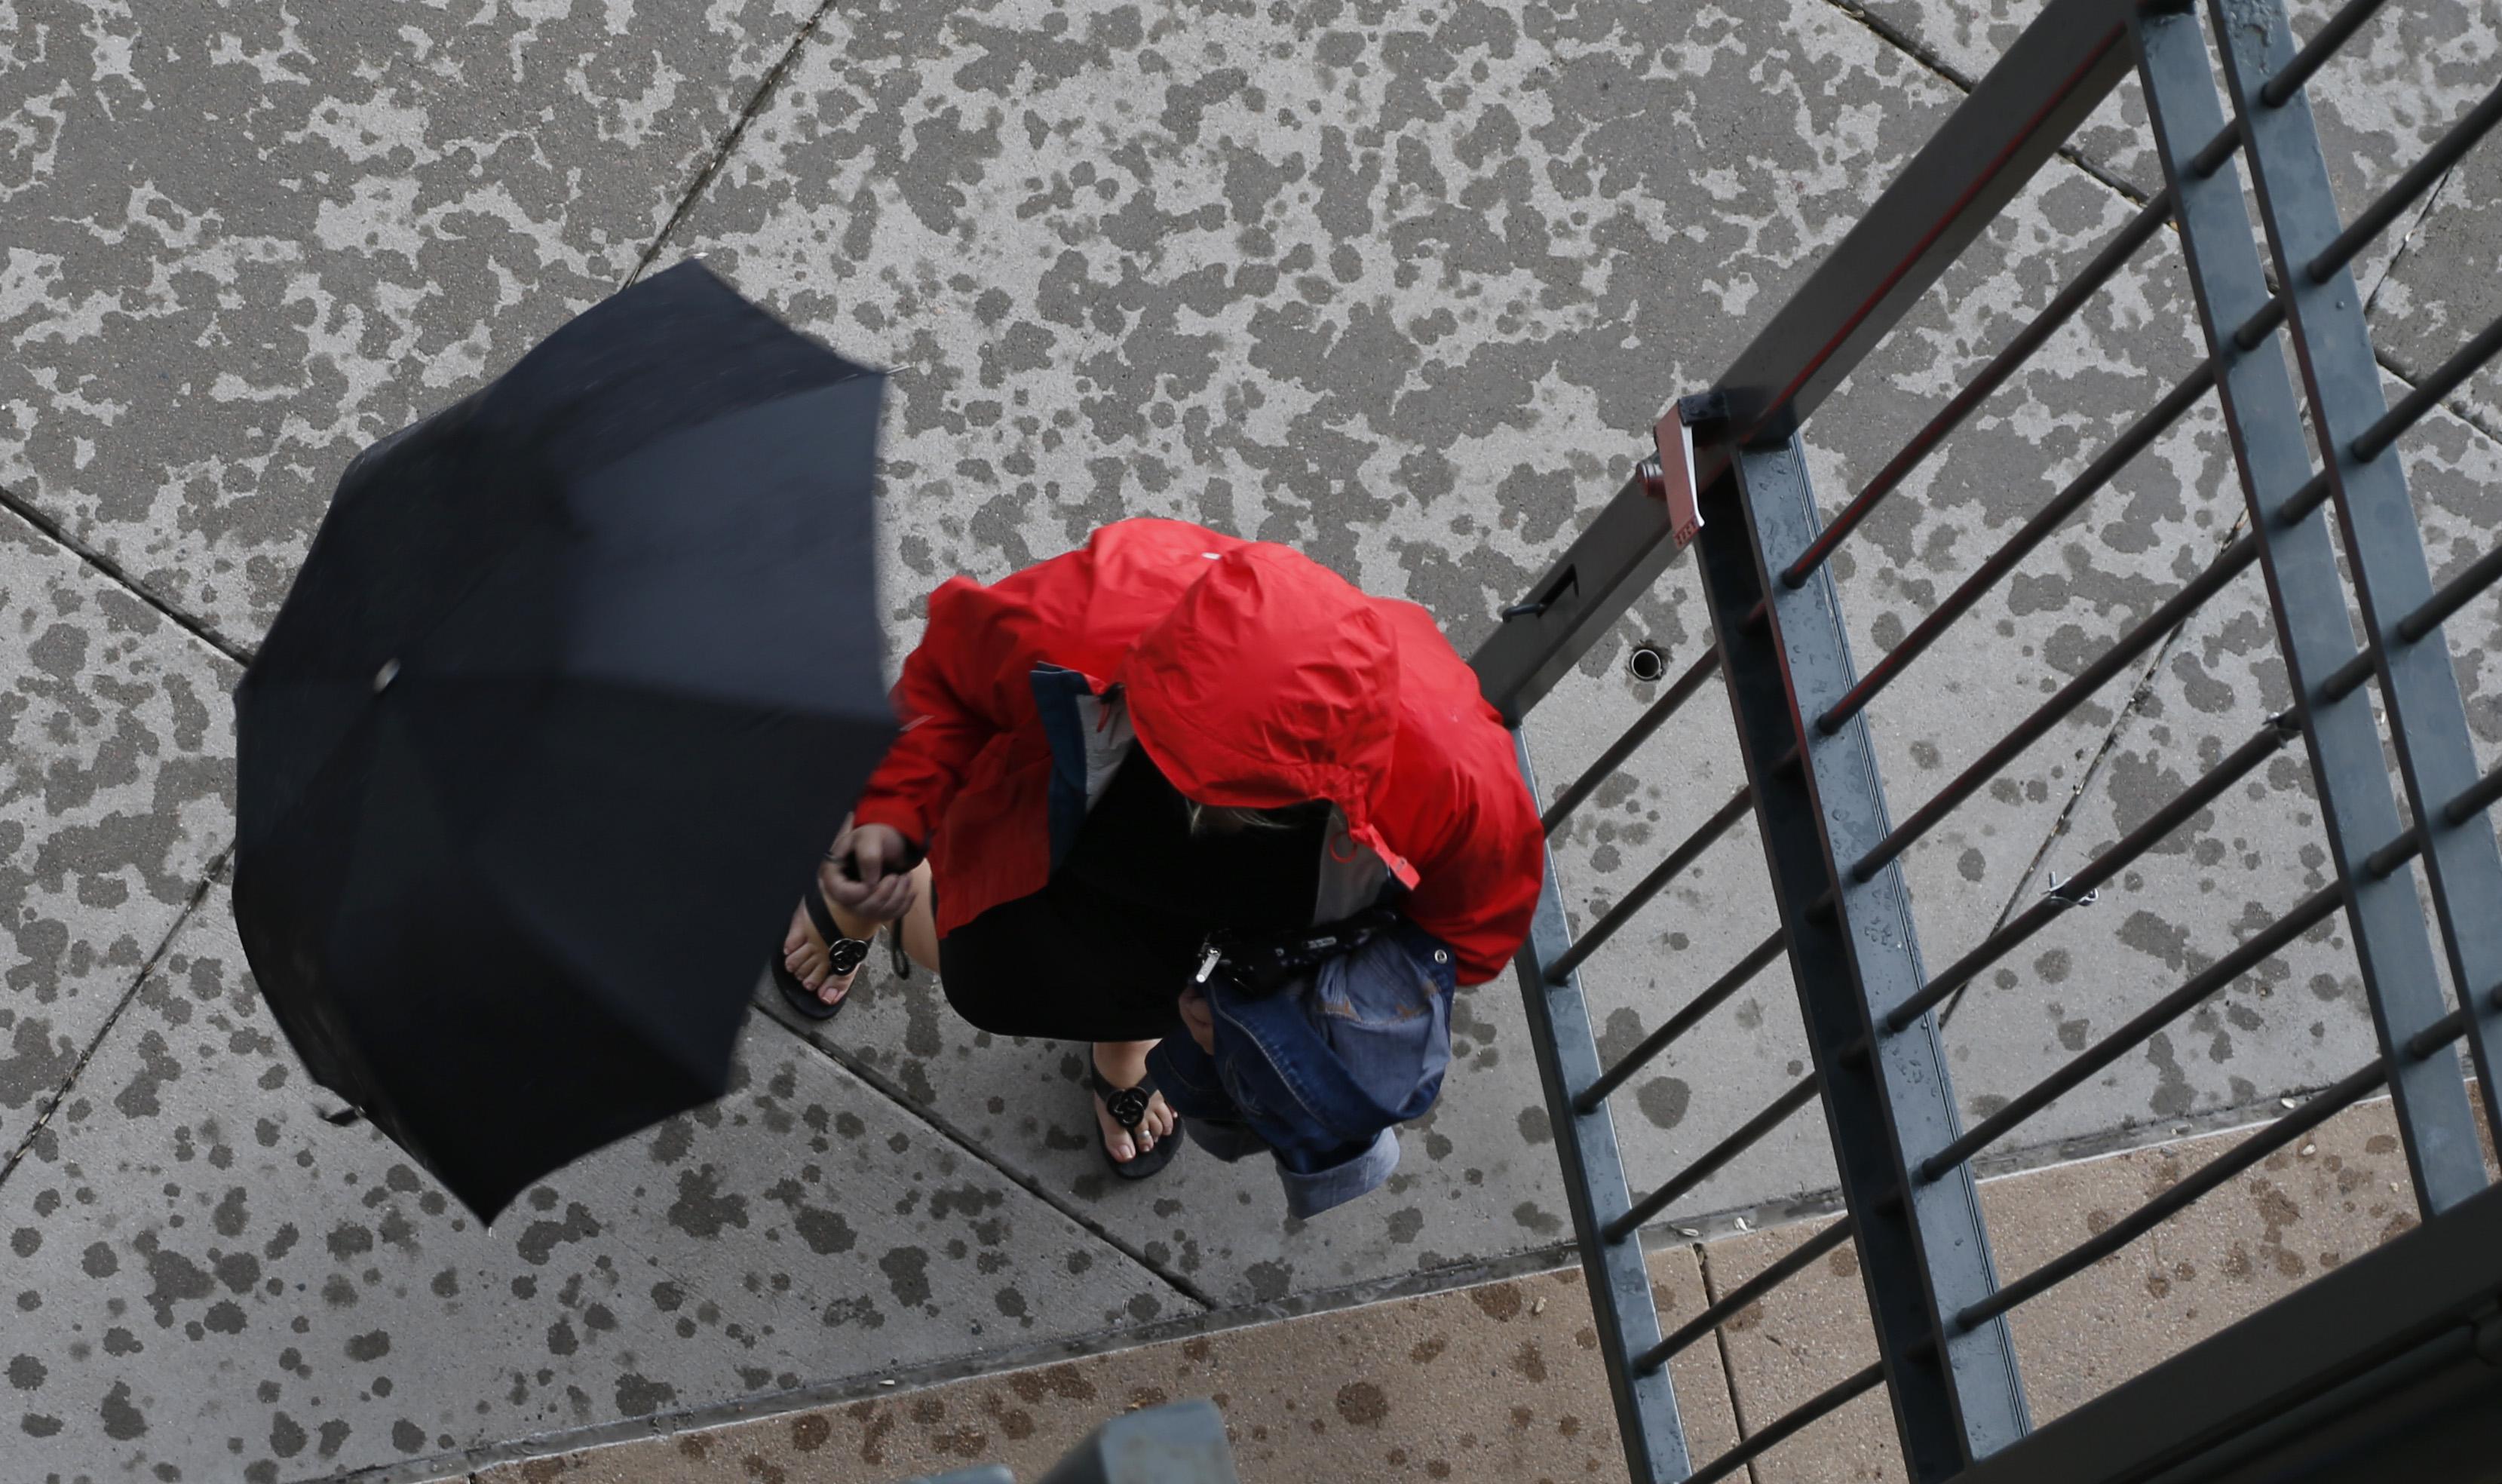 Photo: Denver Rain Storm Monsoon 2015 - AP Photo